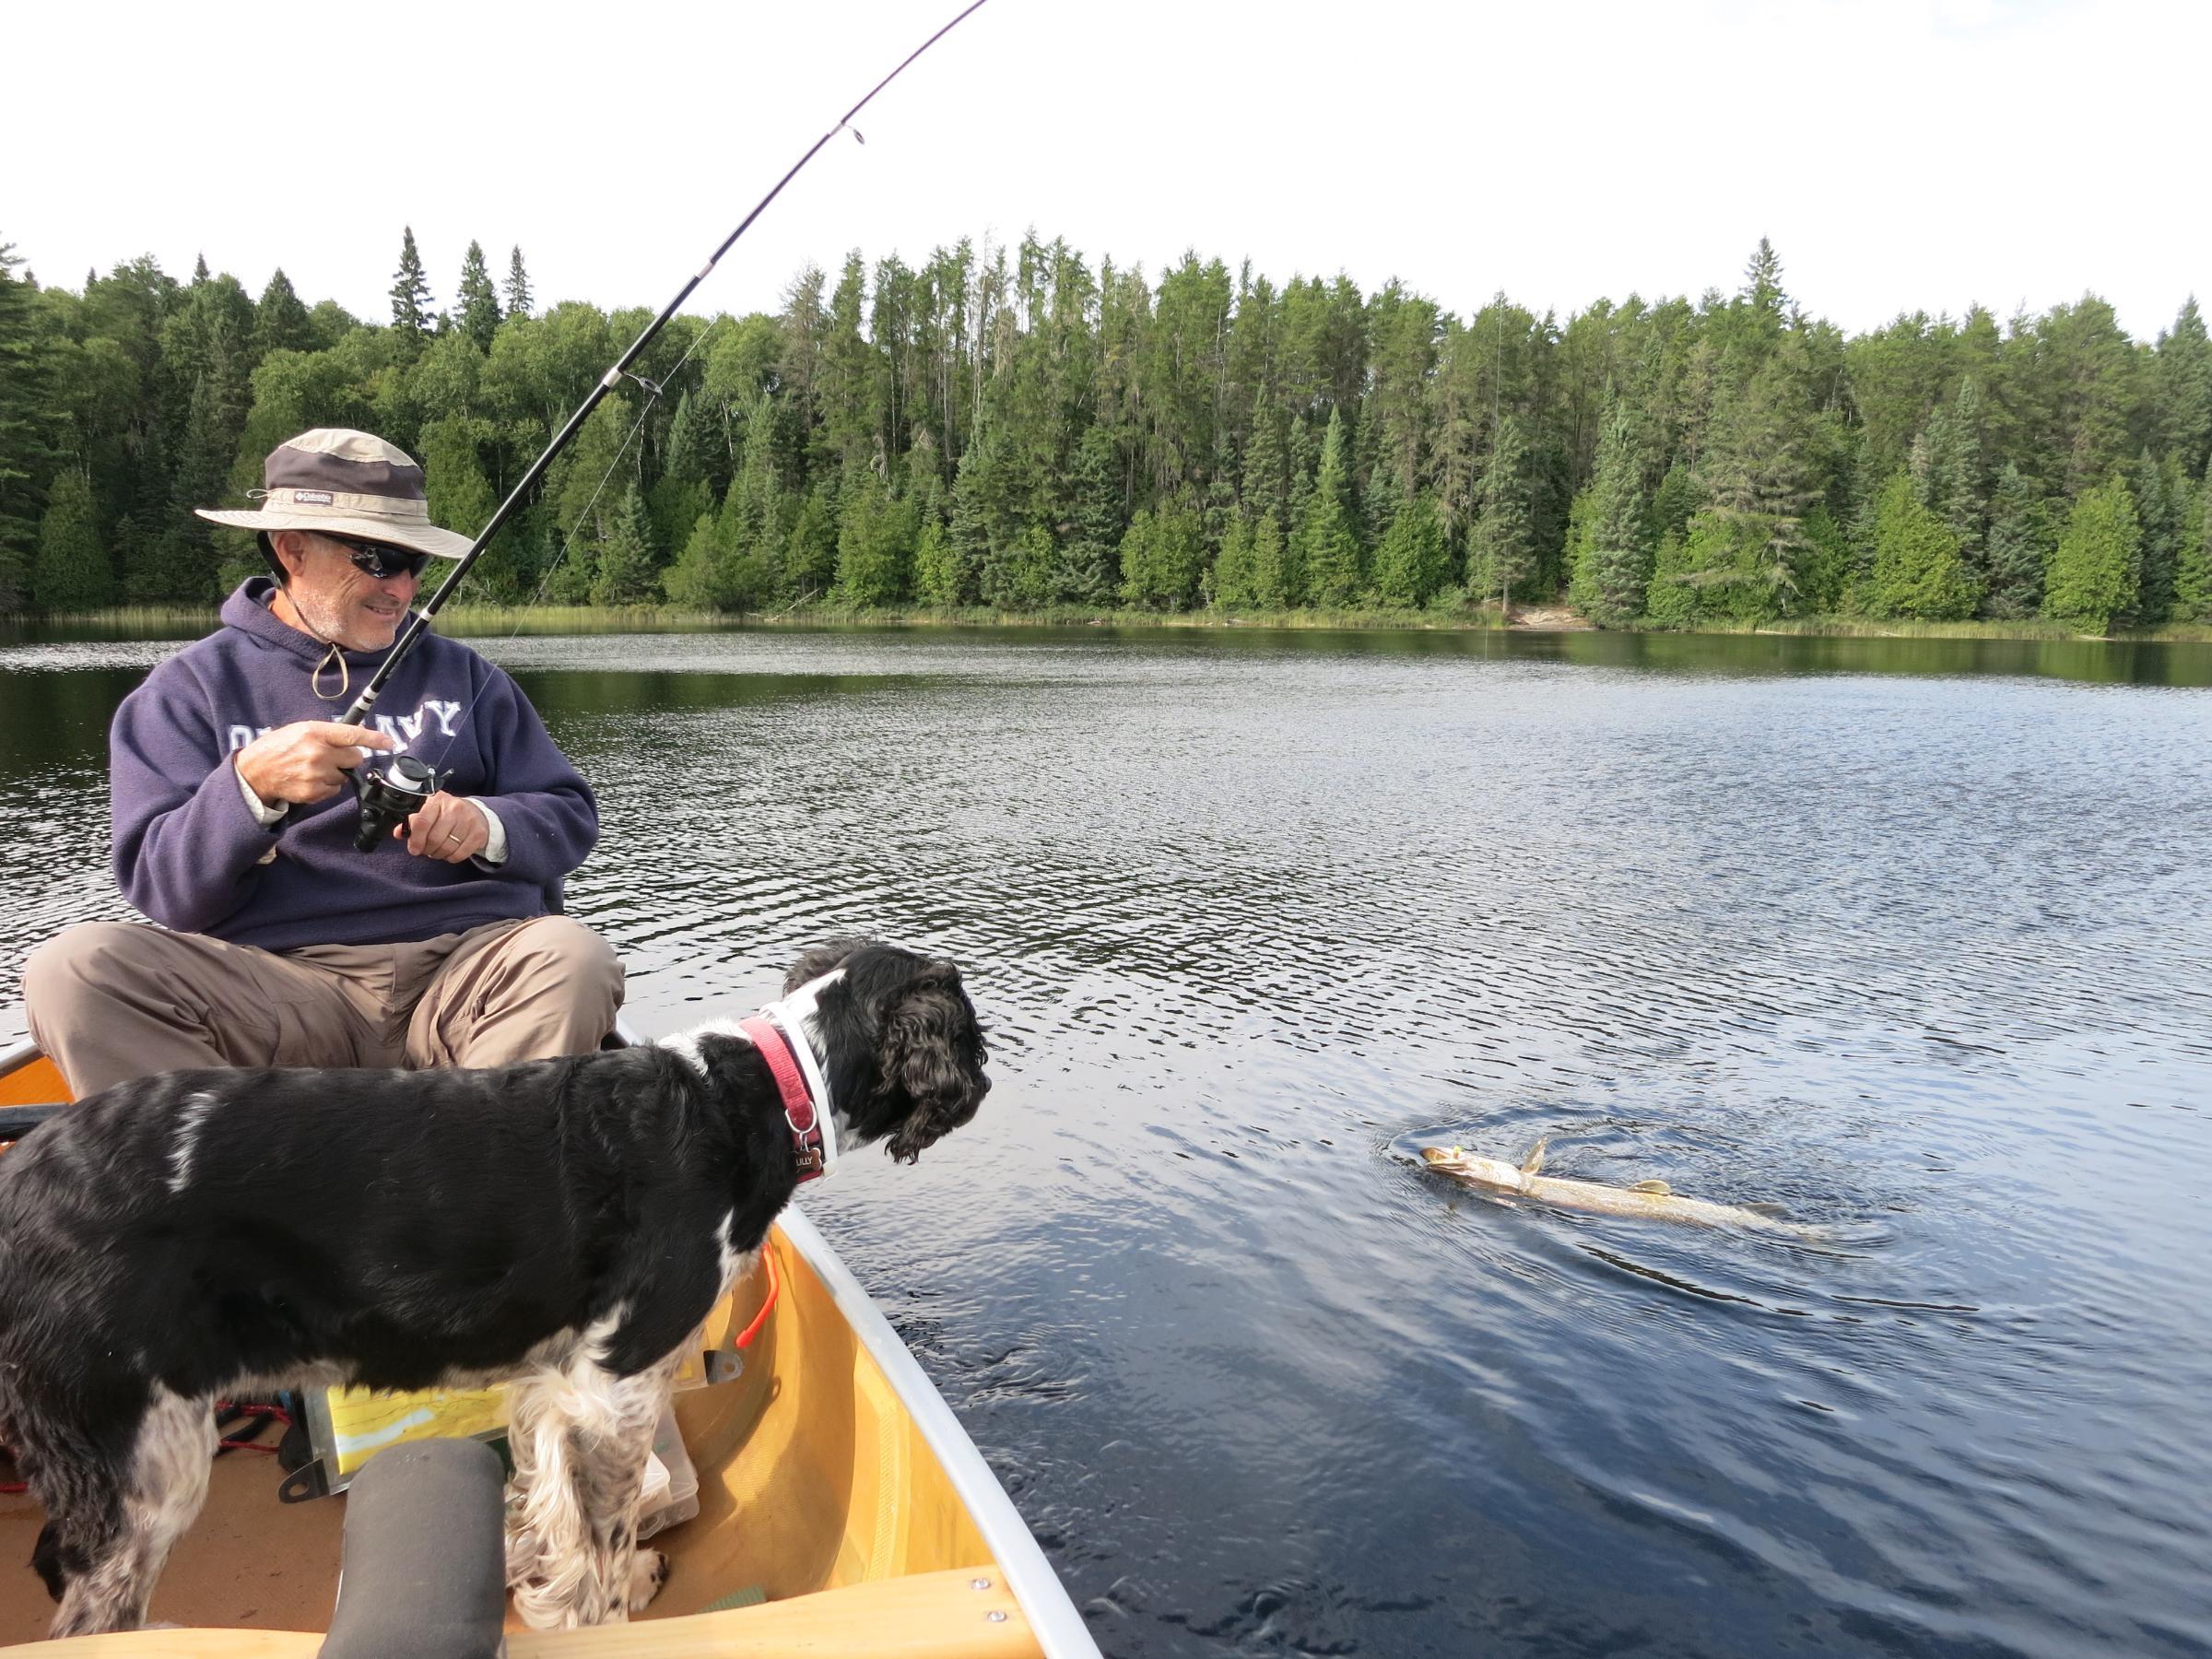 fishing on Long Island Lake